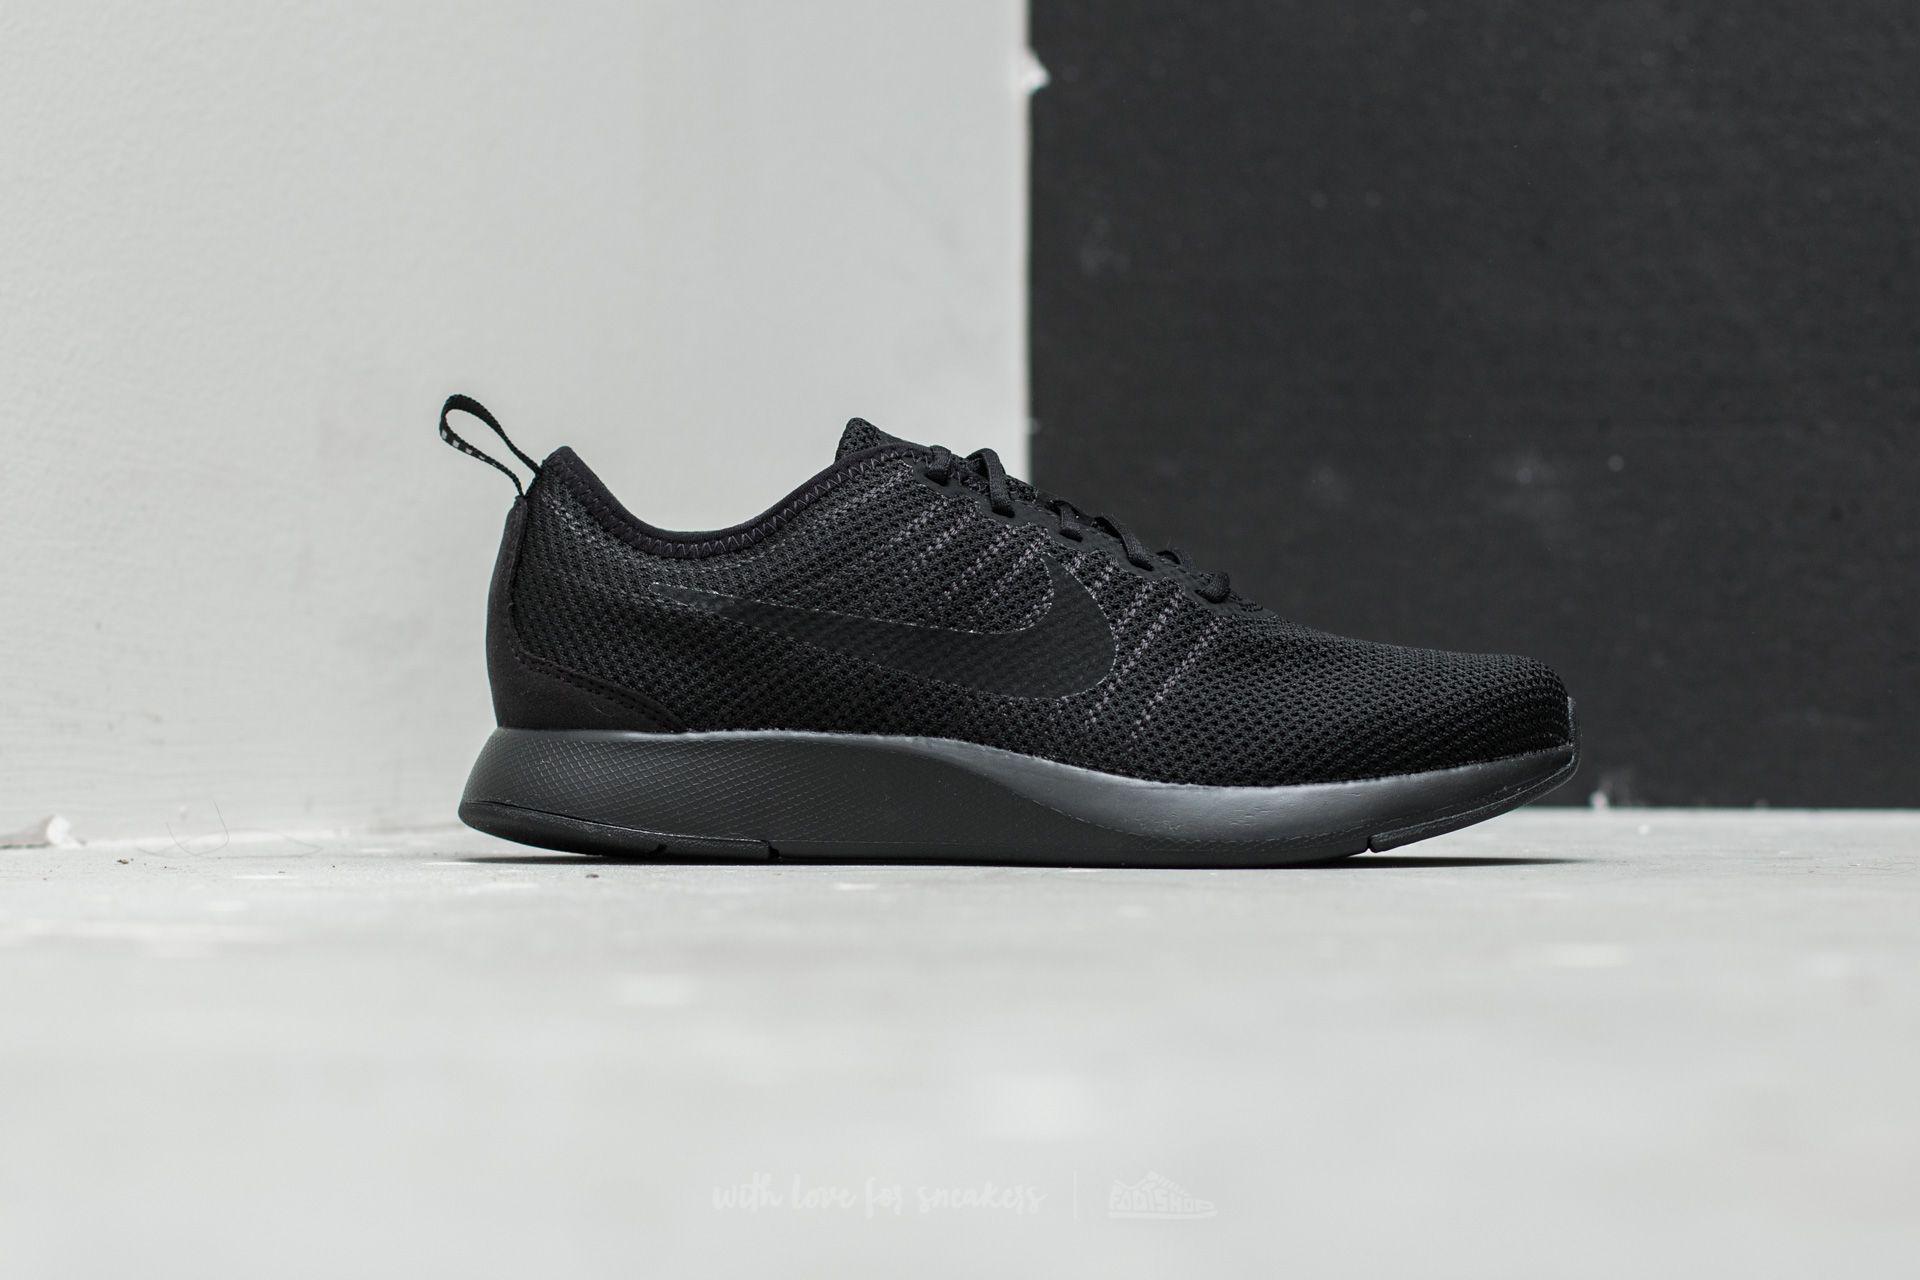 Lyst - Nike Dualtone Racer (gs) Black  Black-black in Black 9e5633a3b1